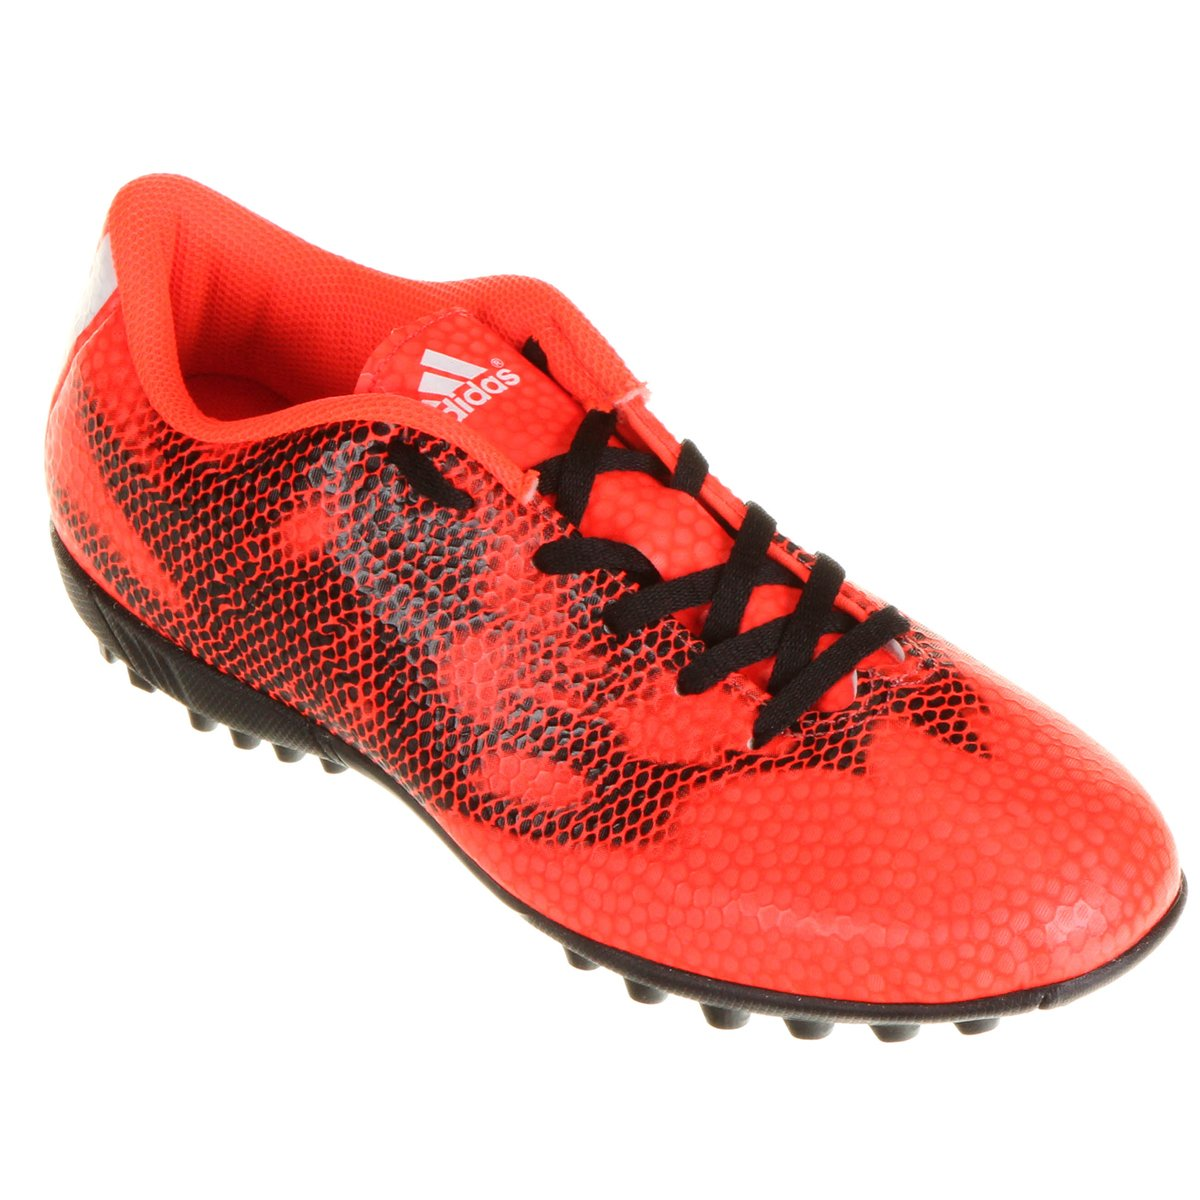 08ac5bf1c4 Chuteira Society Adidas F5 TF Masculina